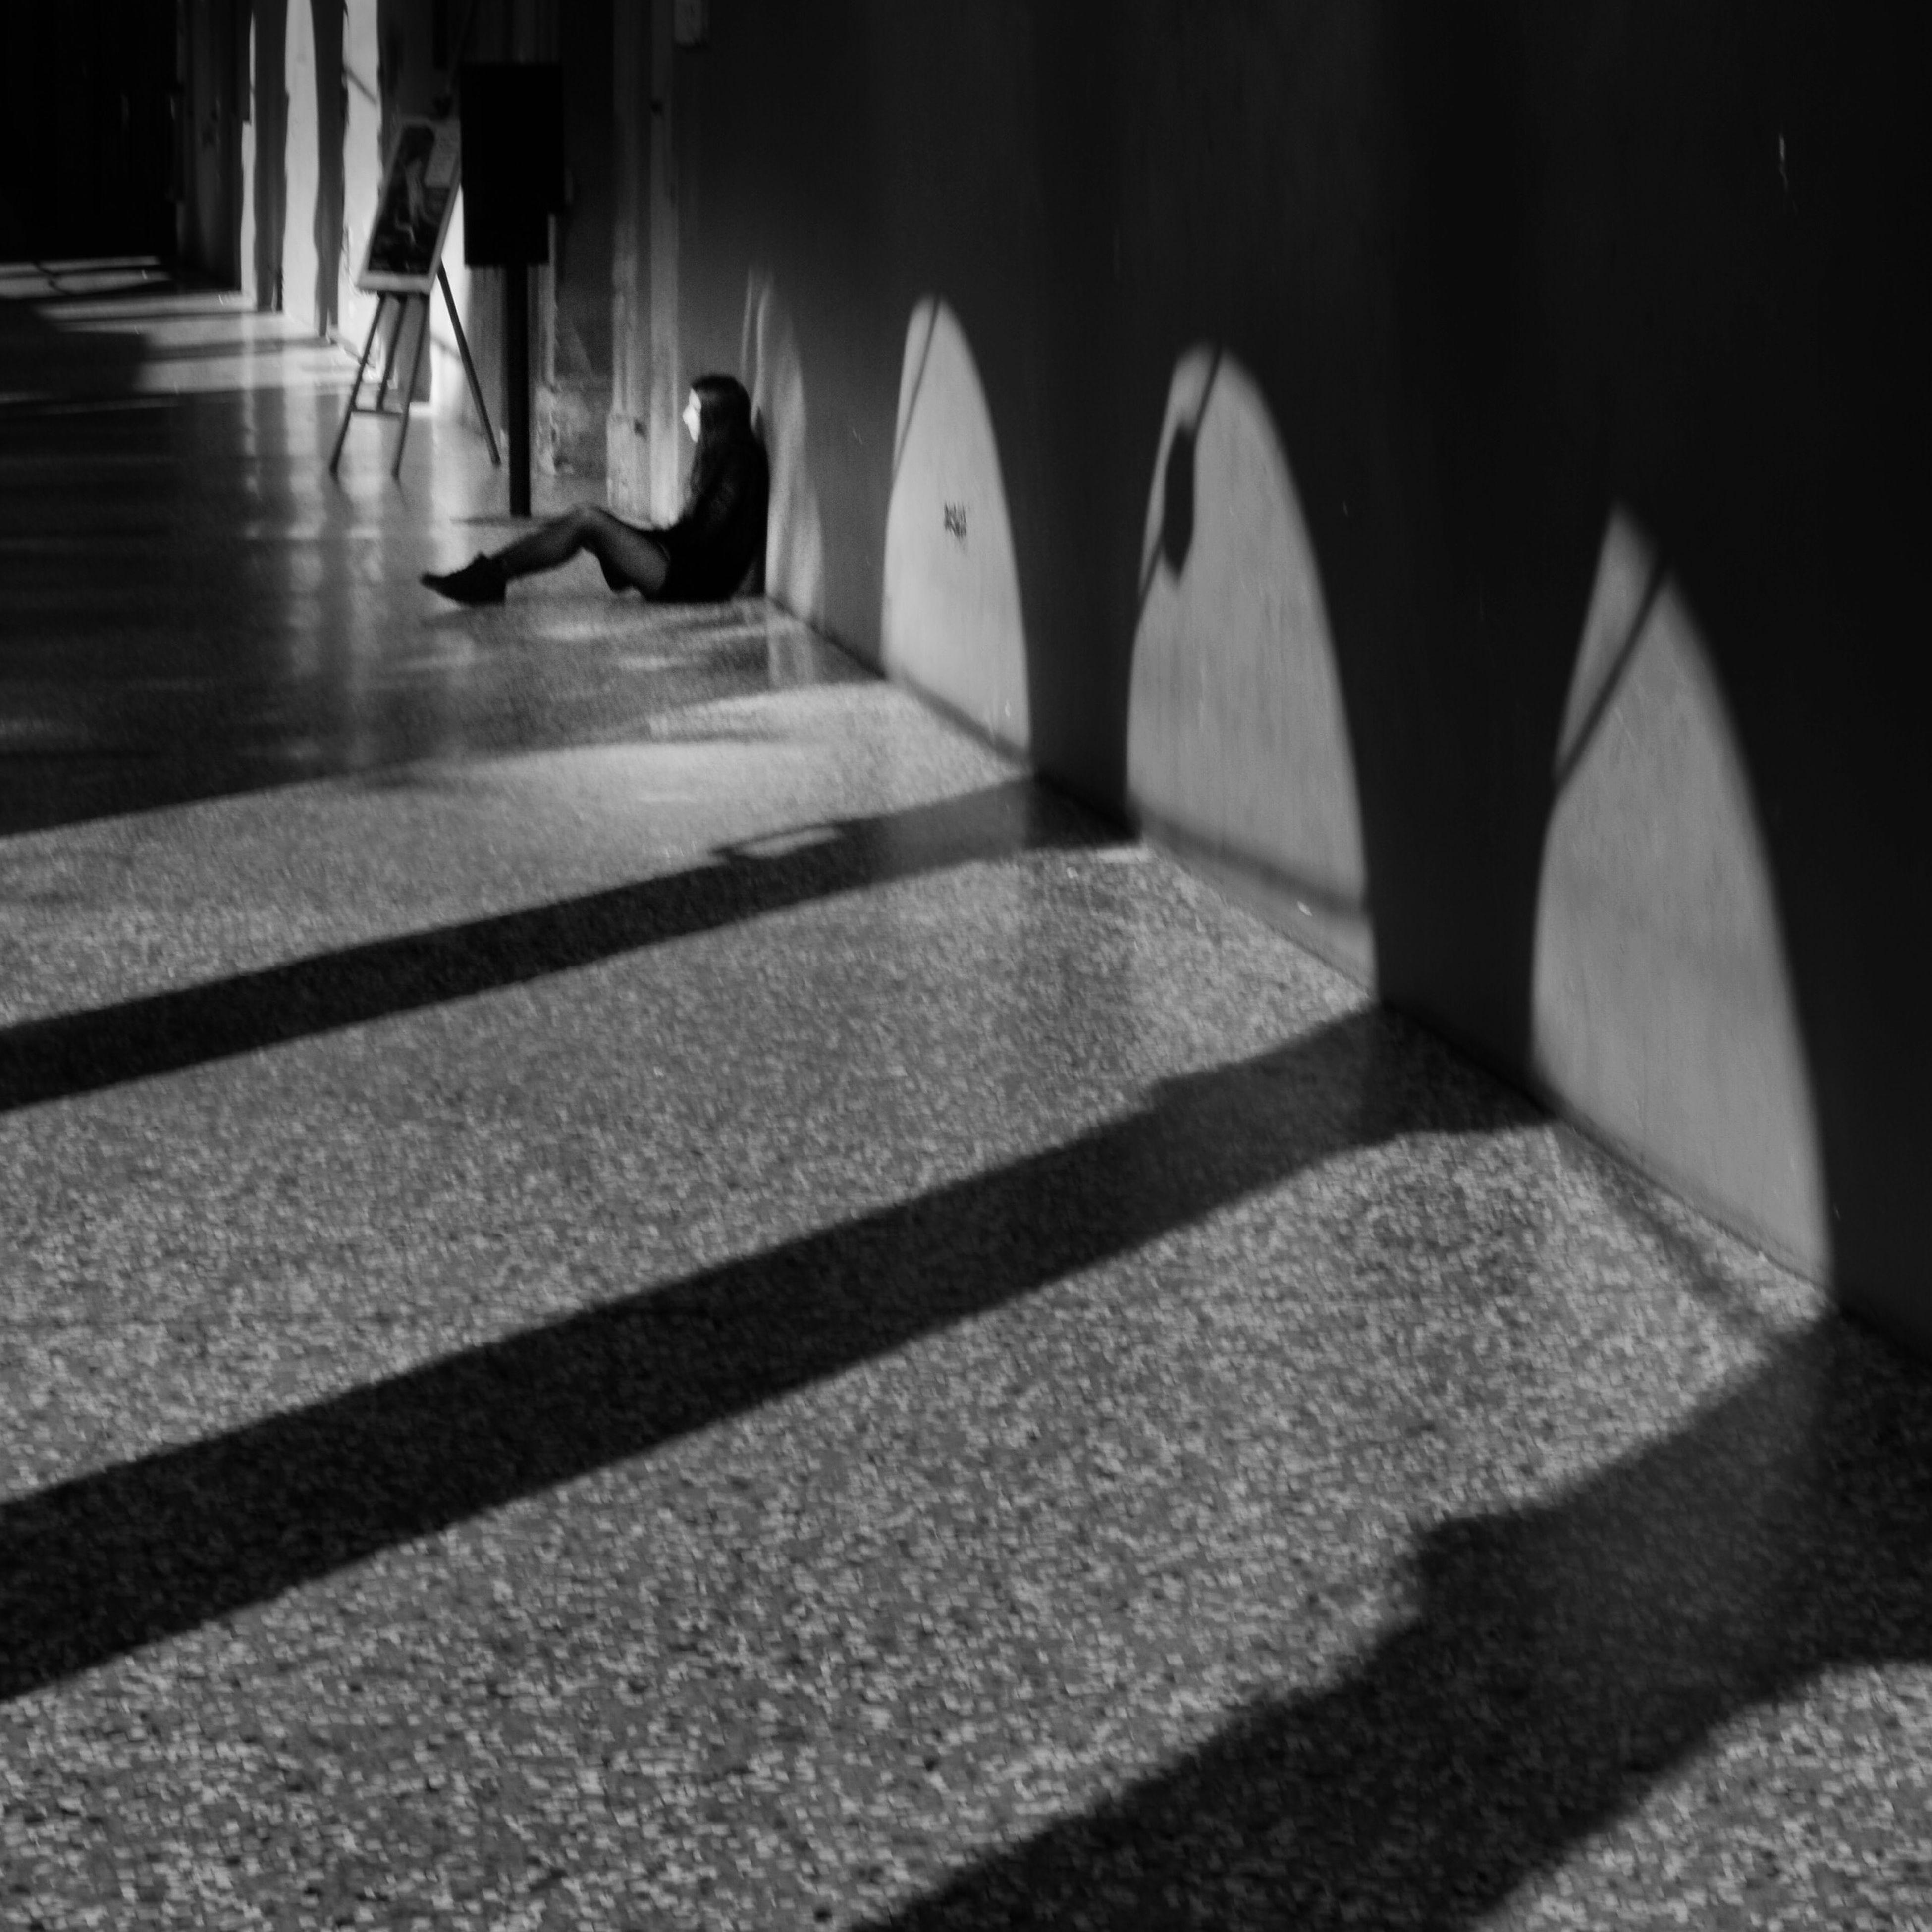 indoors, shadow, tiled floor, flooring, architecture, built structure, sunlight, the way forward, walking, steps, walkway, incidental people, in a row, empty, pattern, corridor, men, cobblestone, day